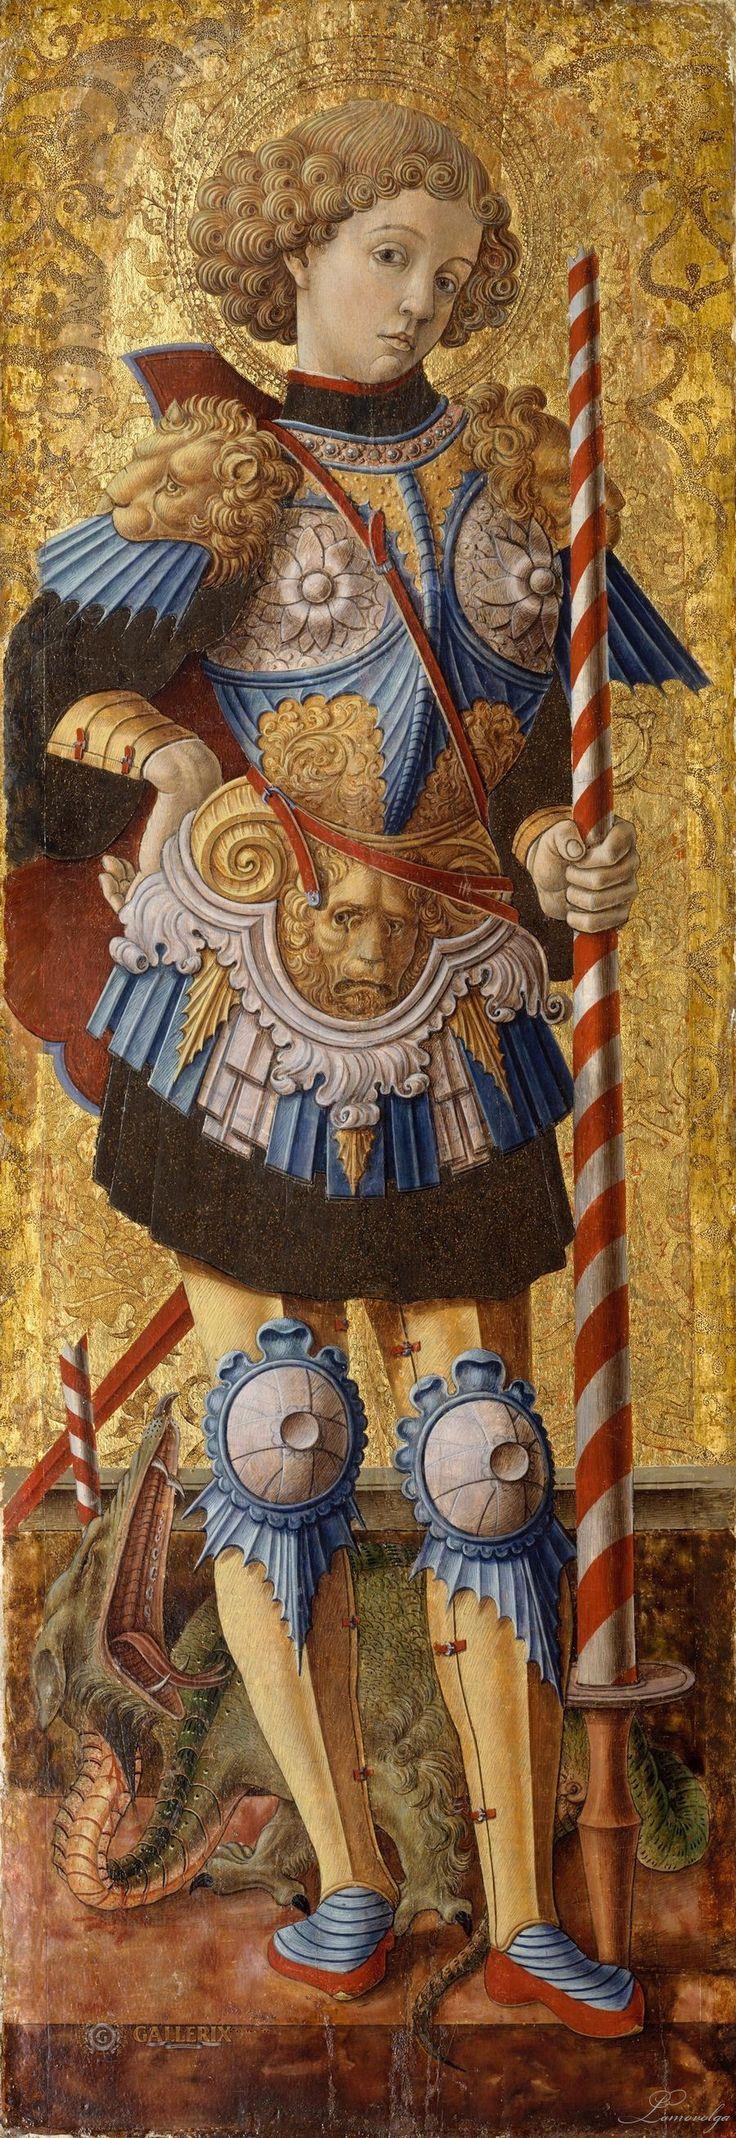 Музей Метрополитен: Карло Кривелли, известен с 1457 - умер 1493 Асколи-Пичено) - Святой Георгий талия, Венеция ( 1472; Темпера на дереве, золотой фон; 38 х 13 1/4 дюйма (96,5 х 33,7 см);: